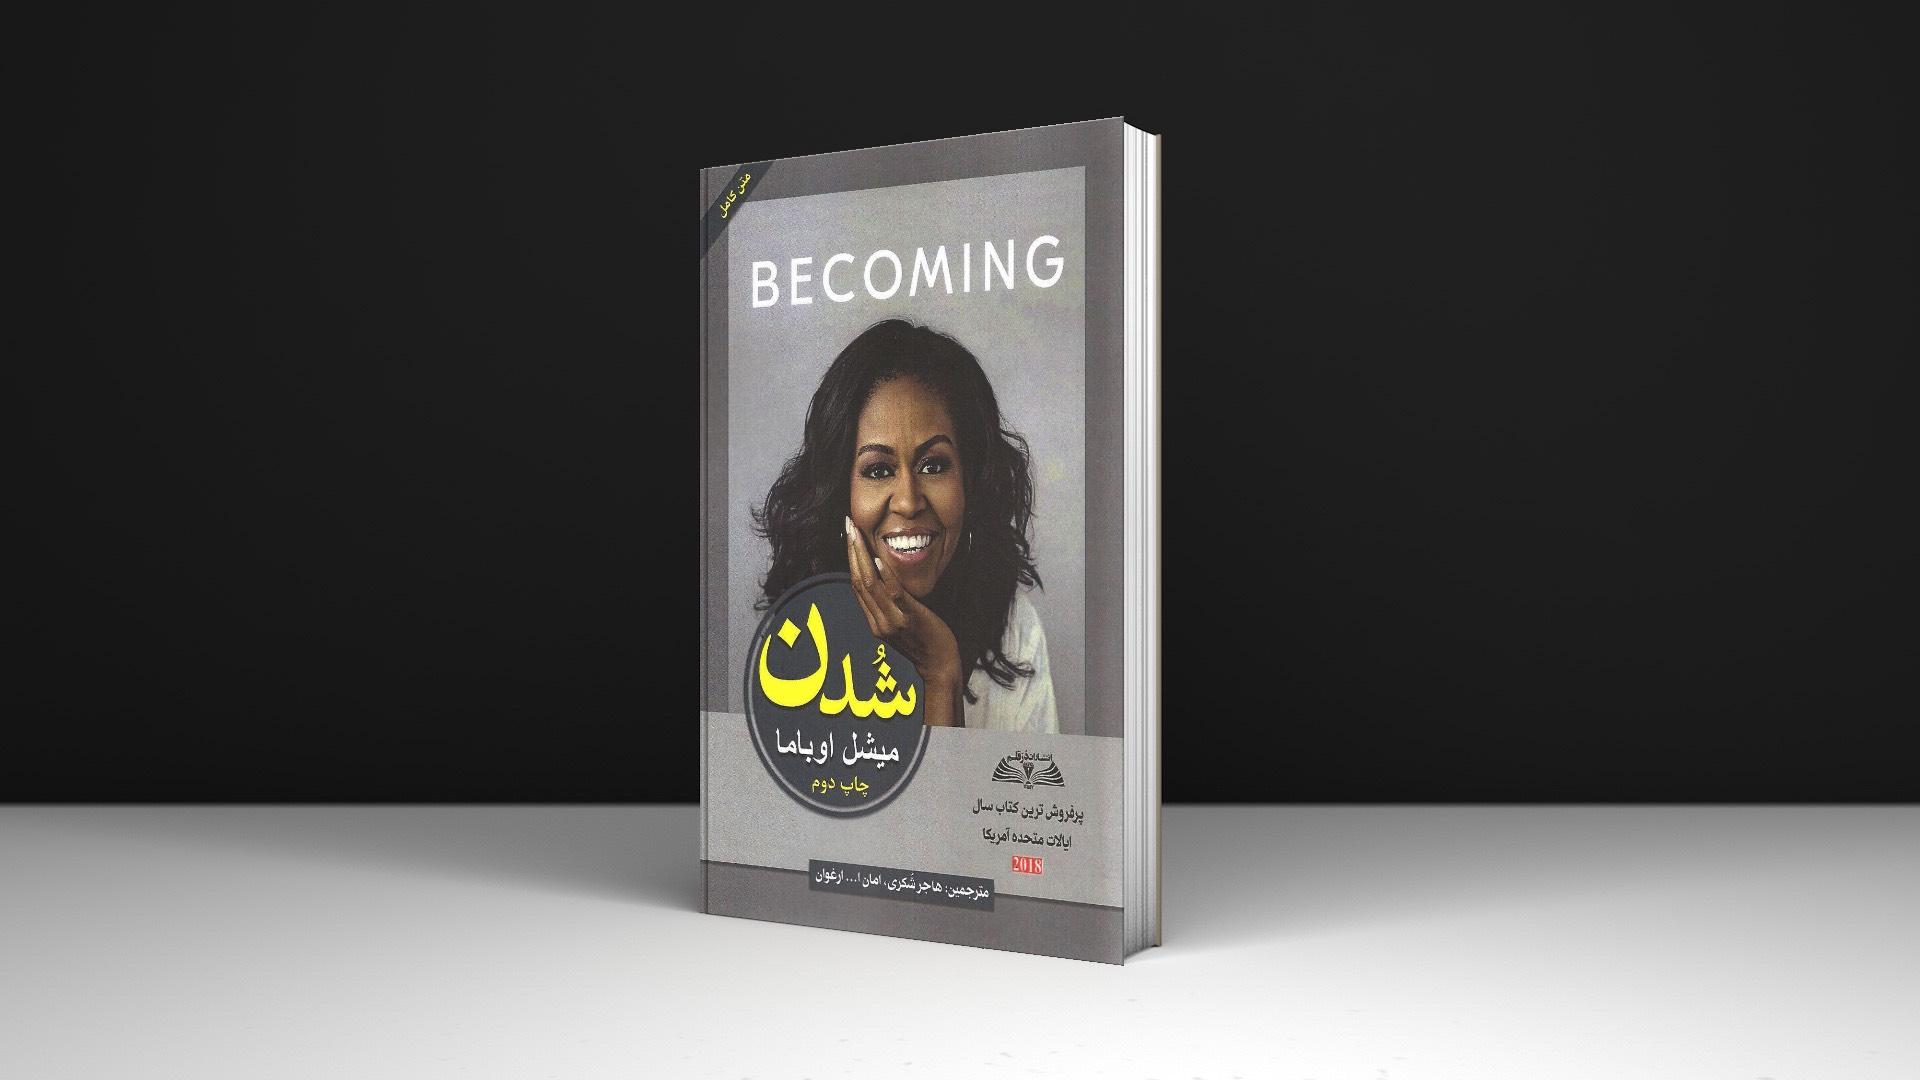 کتاب شدن اثر میشل اوباما